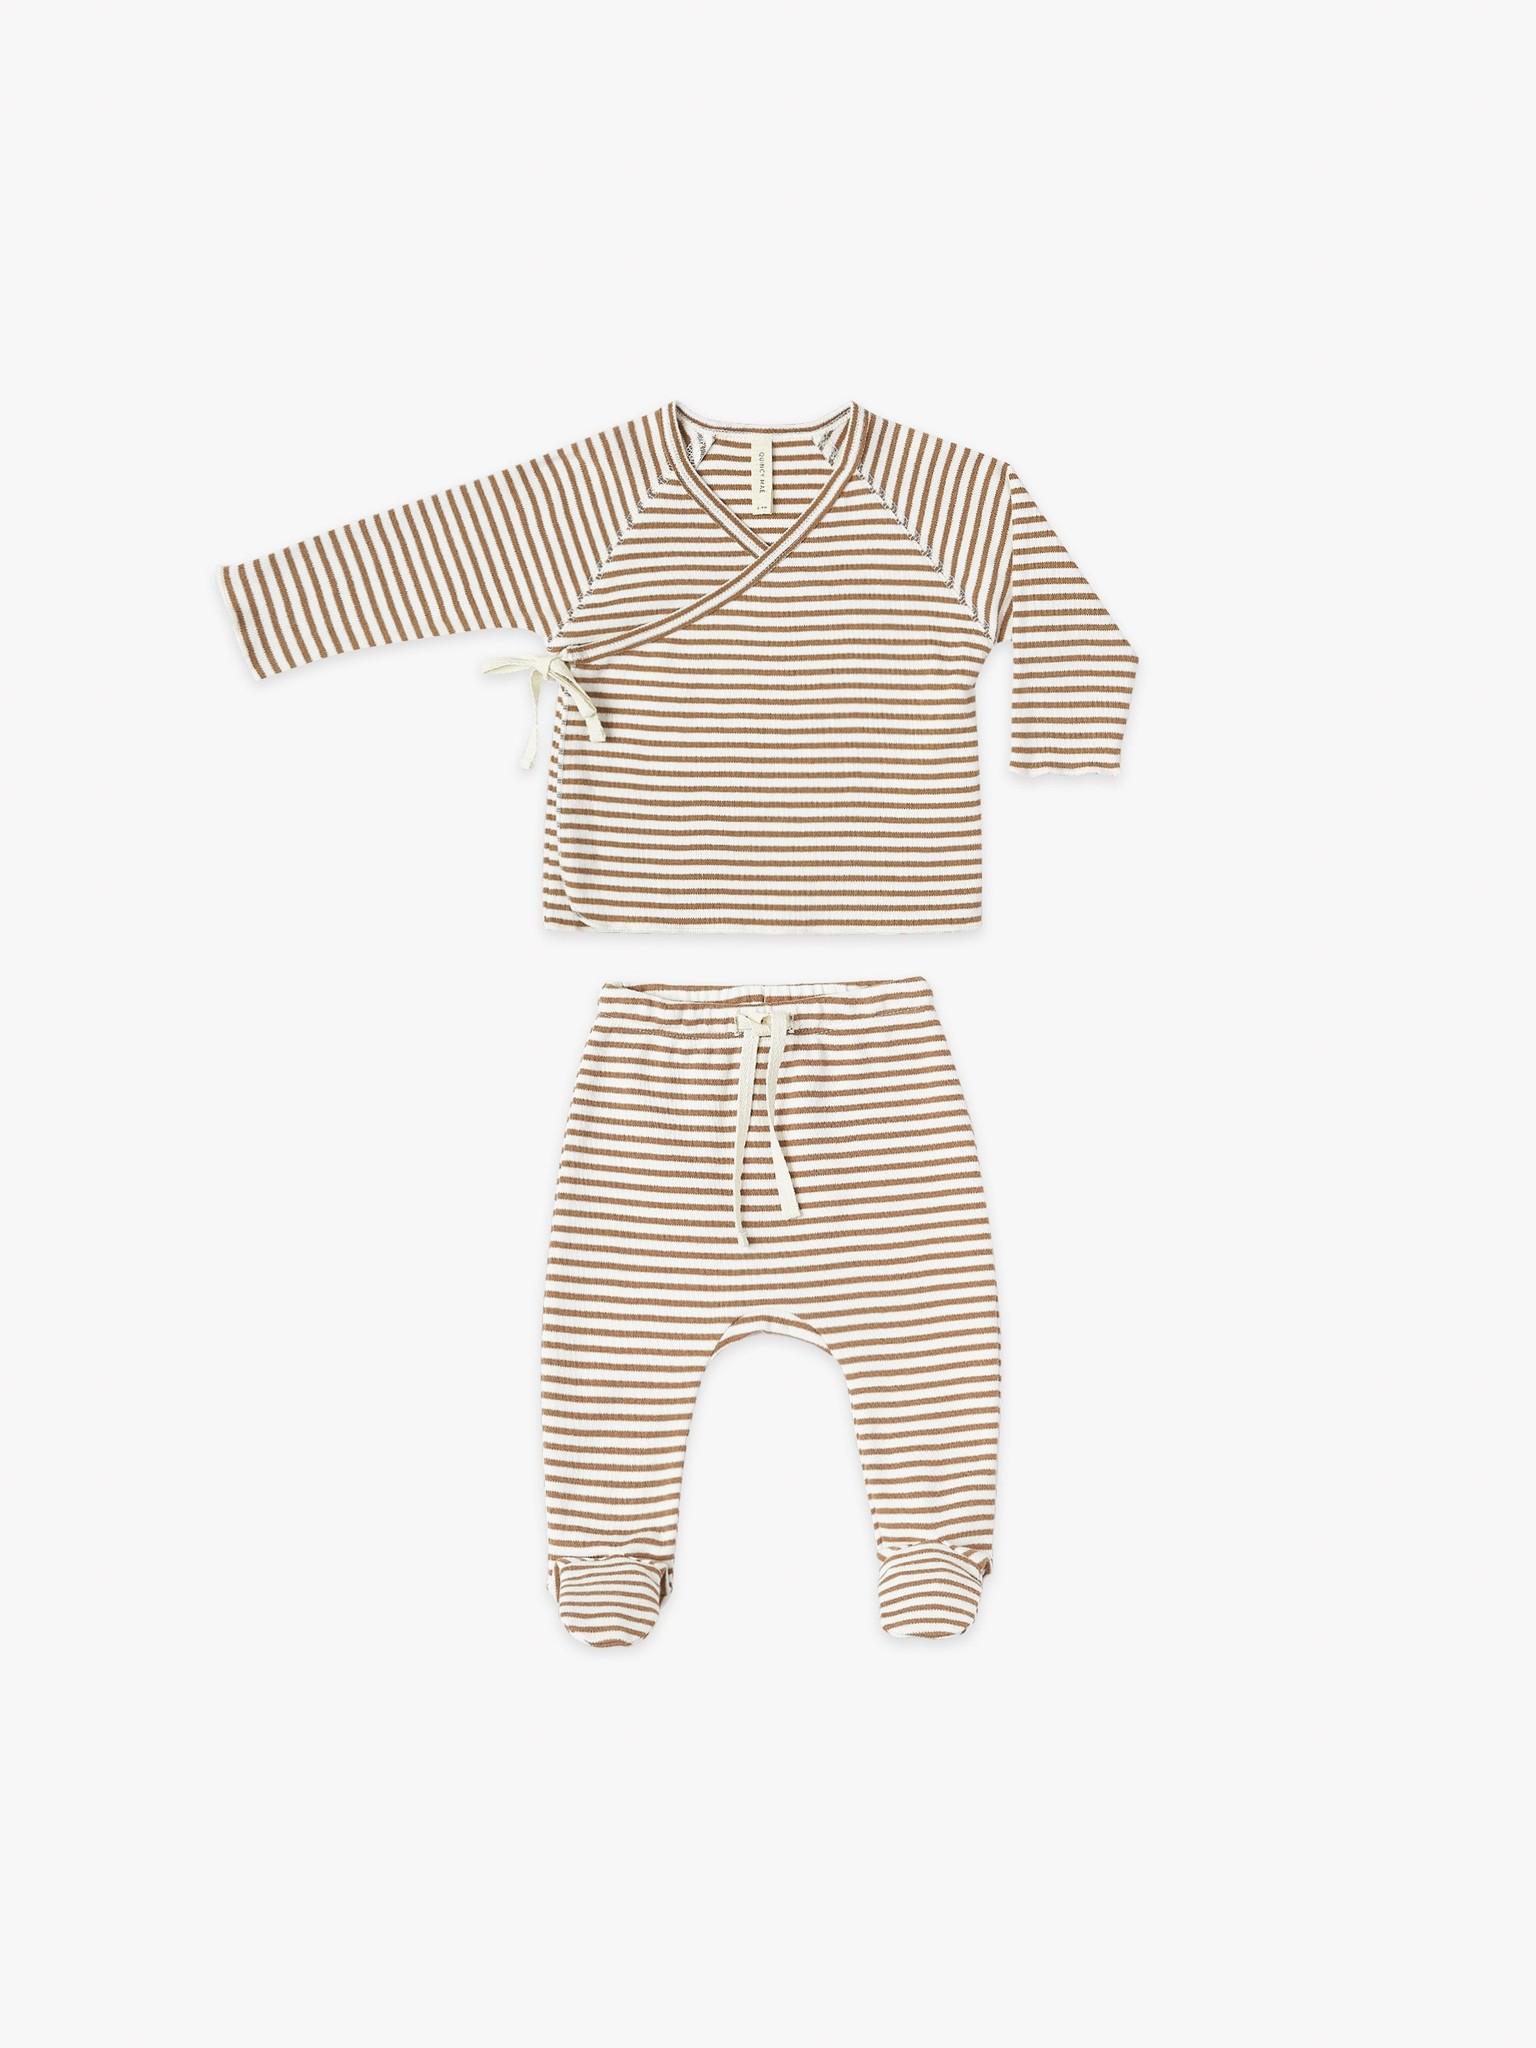 Quincy Mae Kimono Top+Footed Pant Rust Stripe